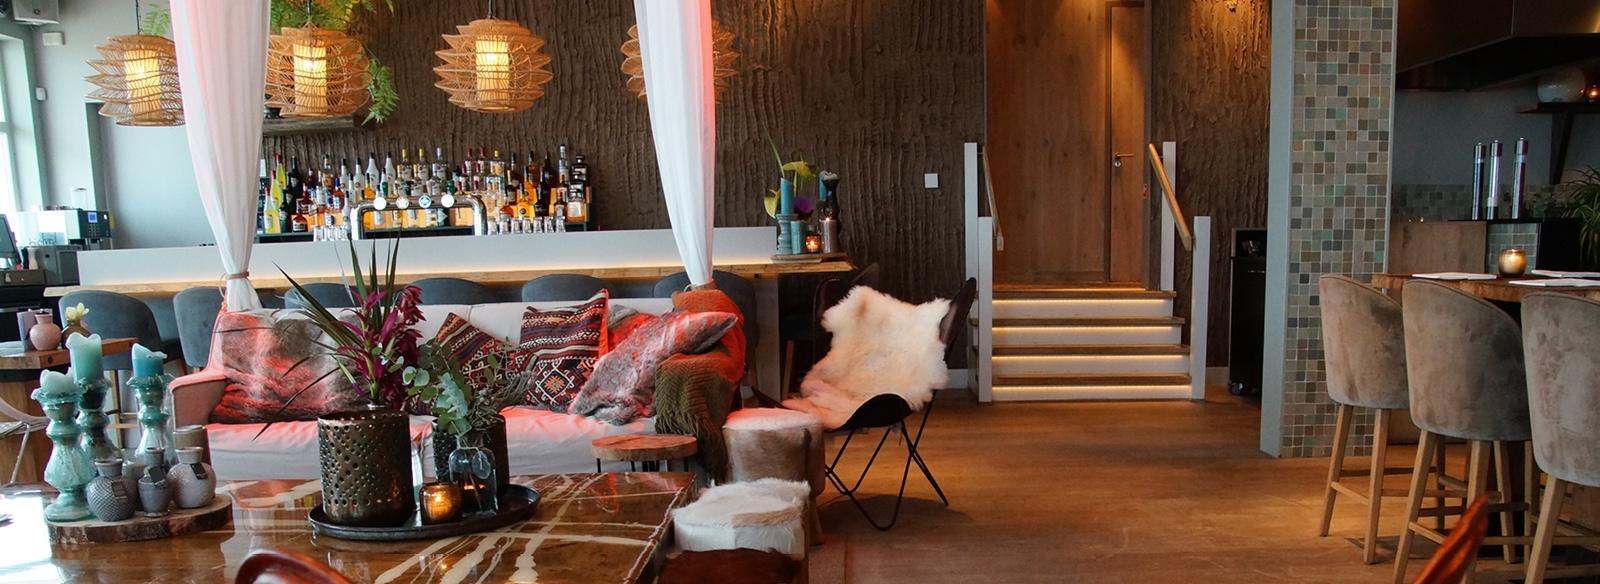 Contact - perfect beach venue - Alexander Beach Club Noordwijk